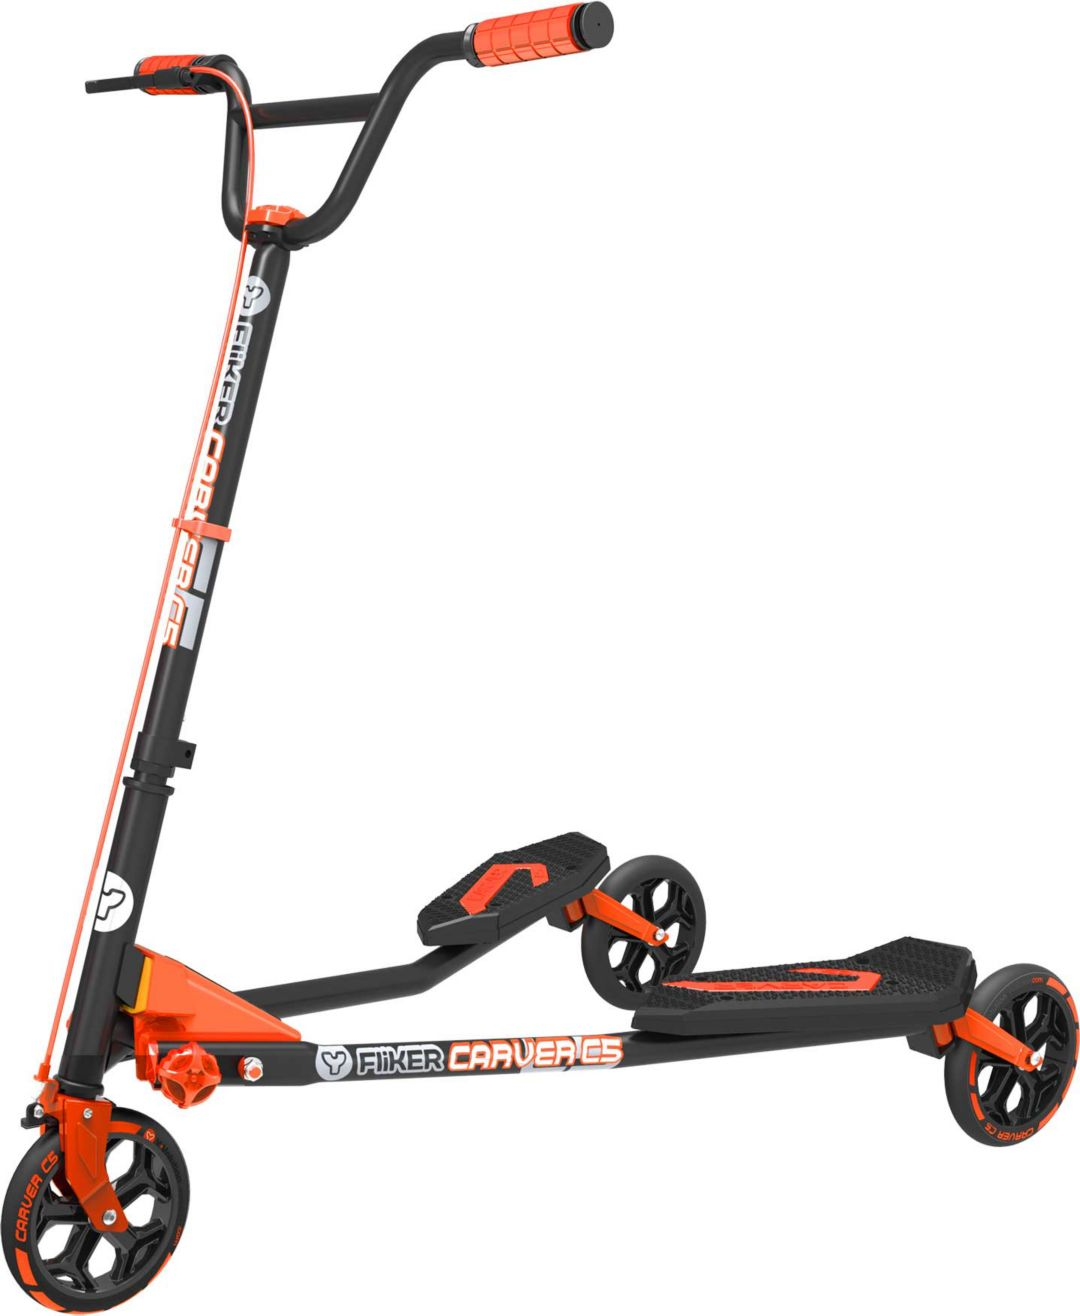 Y Fliker Scooter >> Yvolution Y Fliker Carver C5 Scooter Dick S Sporting Goods